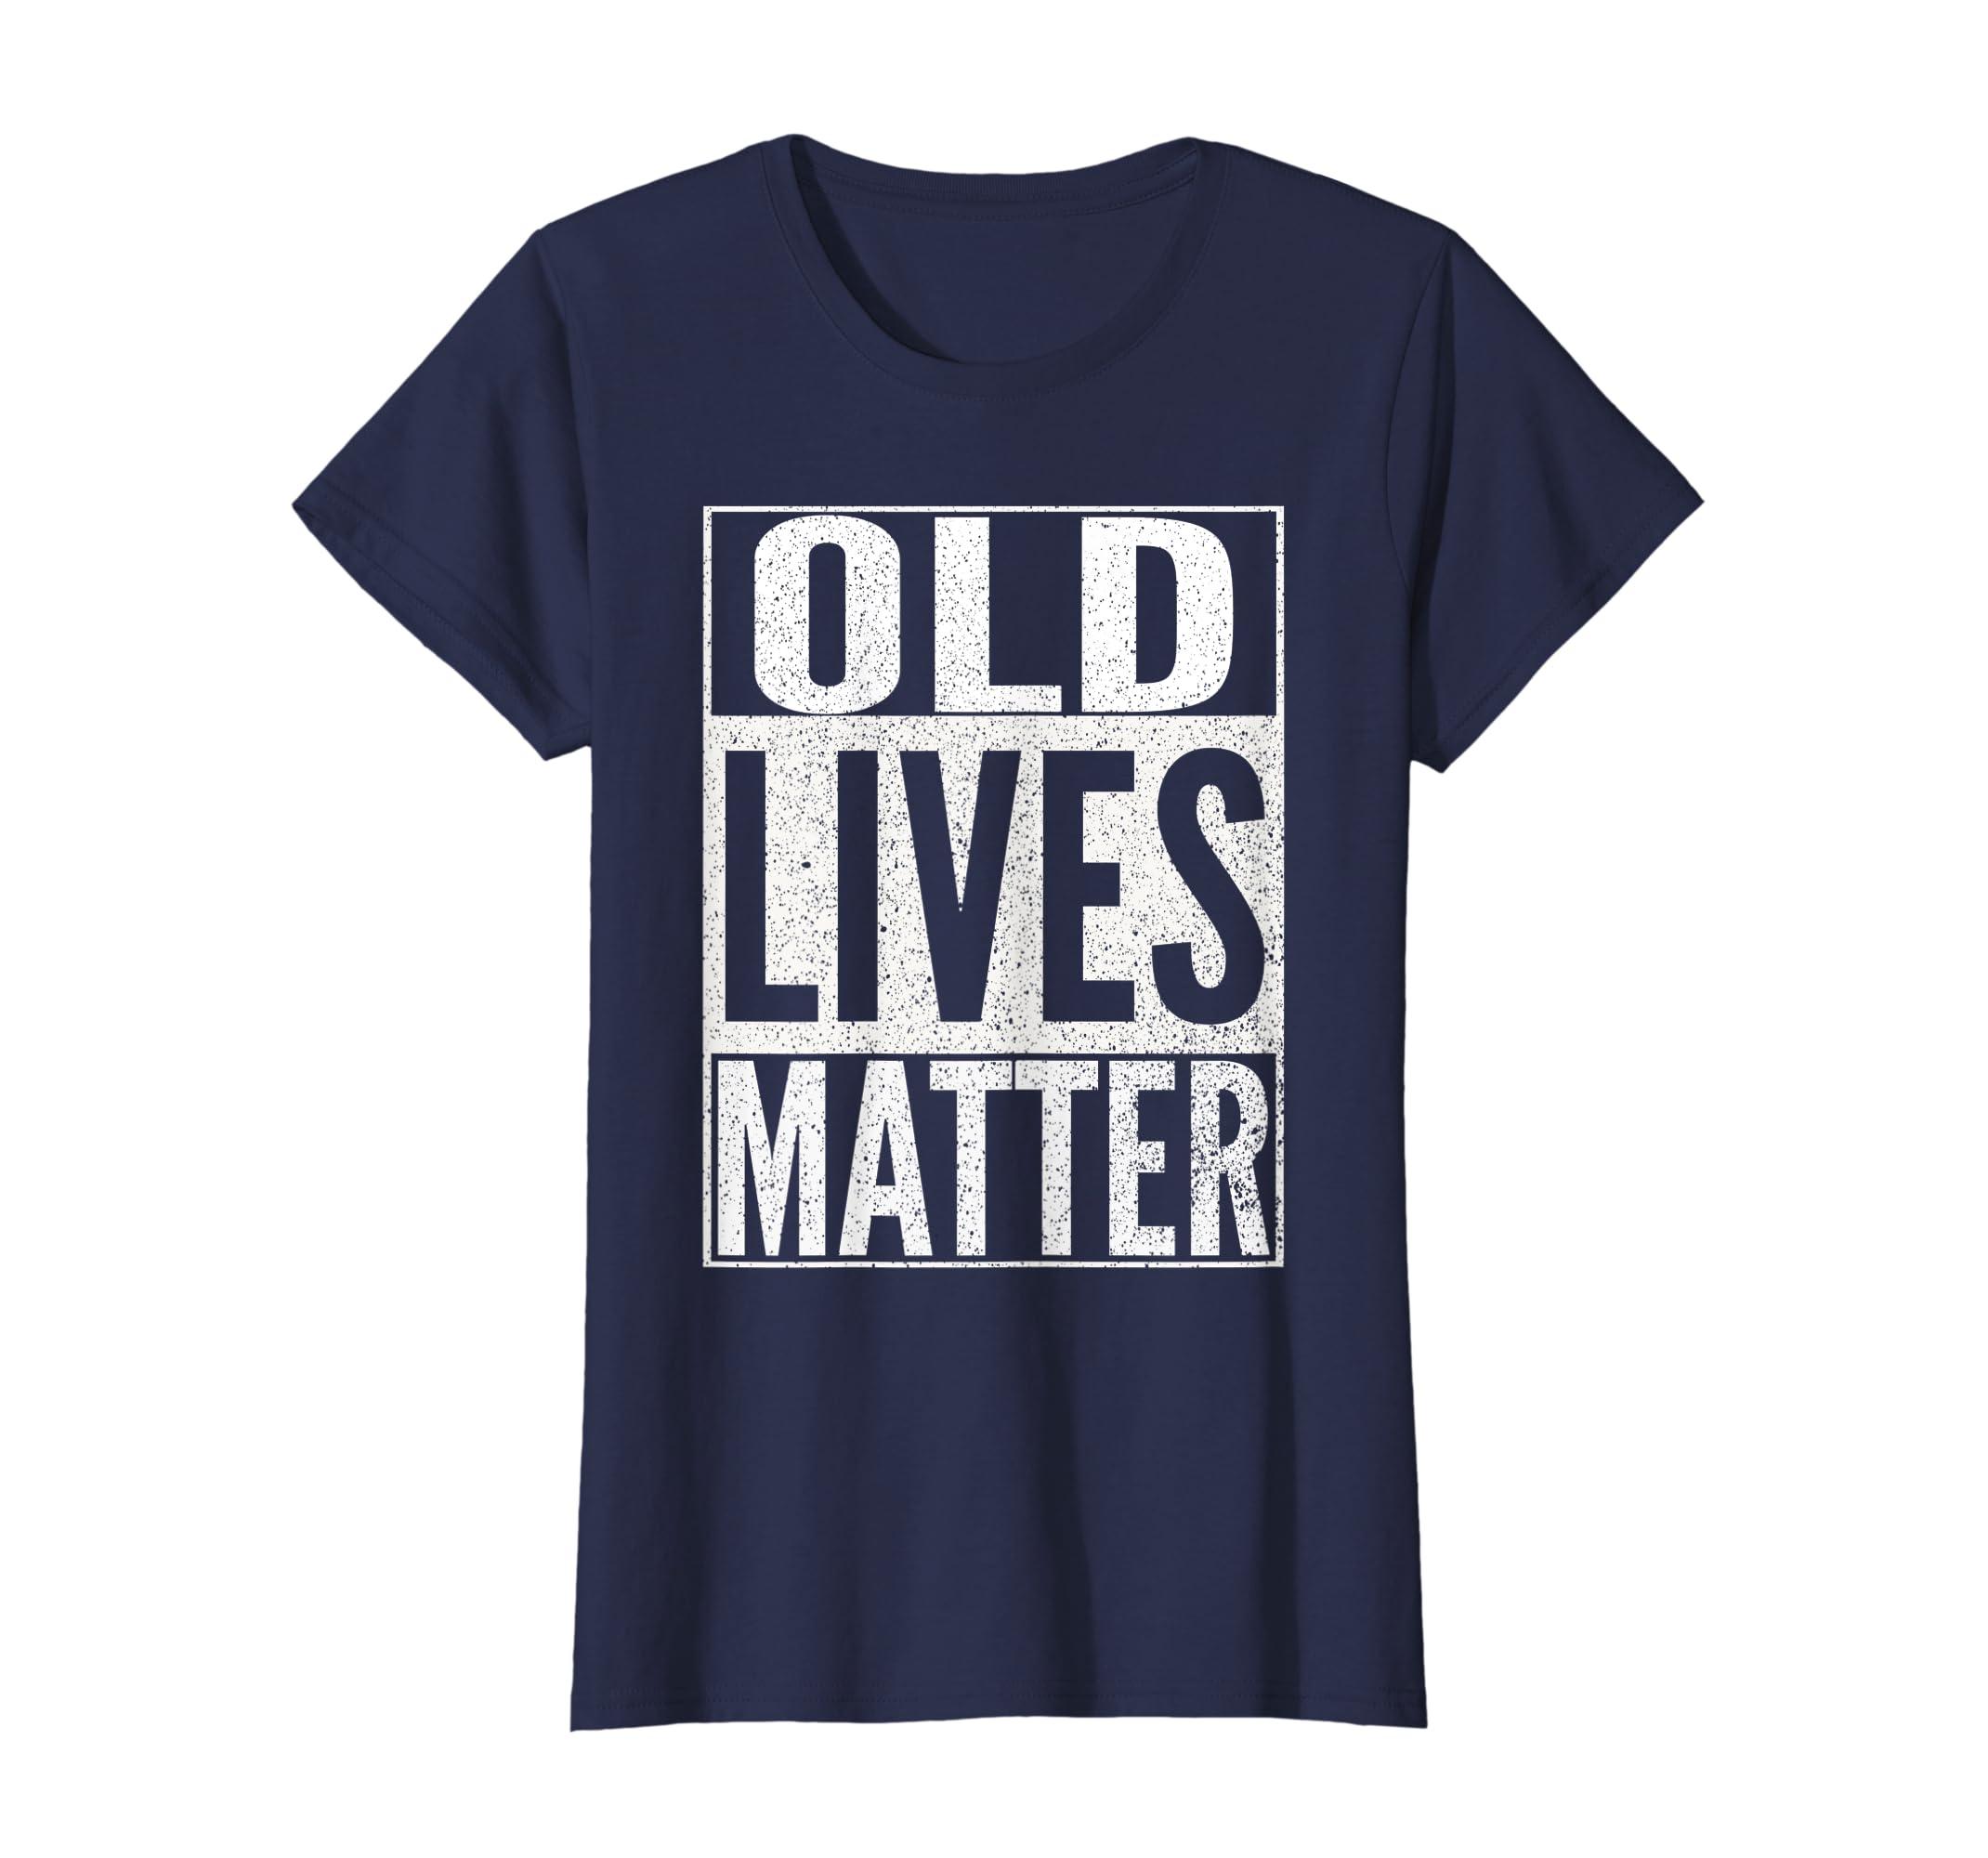 76f5b137fa Amazon.com: 60th 50th 40th Birthday T Shirt Father's Day Gift 1979 1969:  Clothing